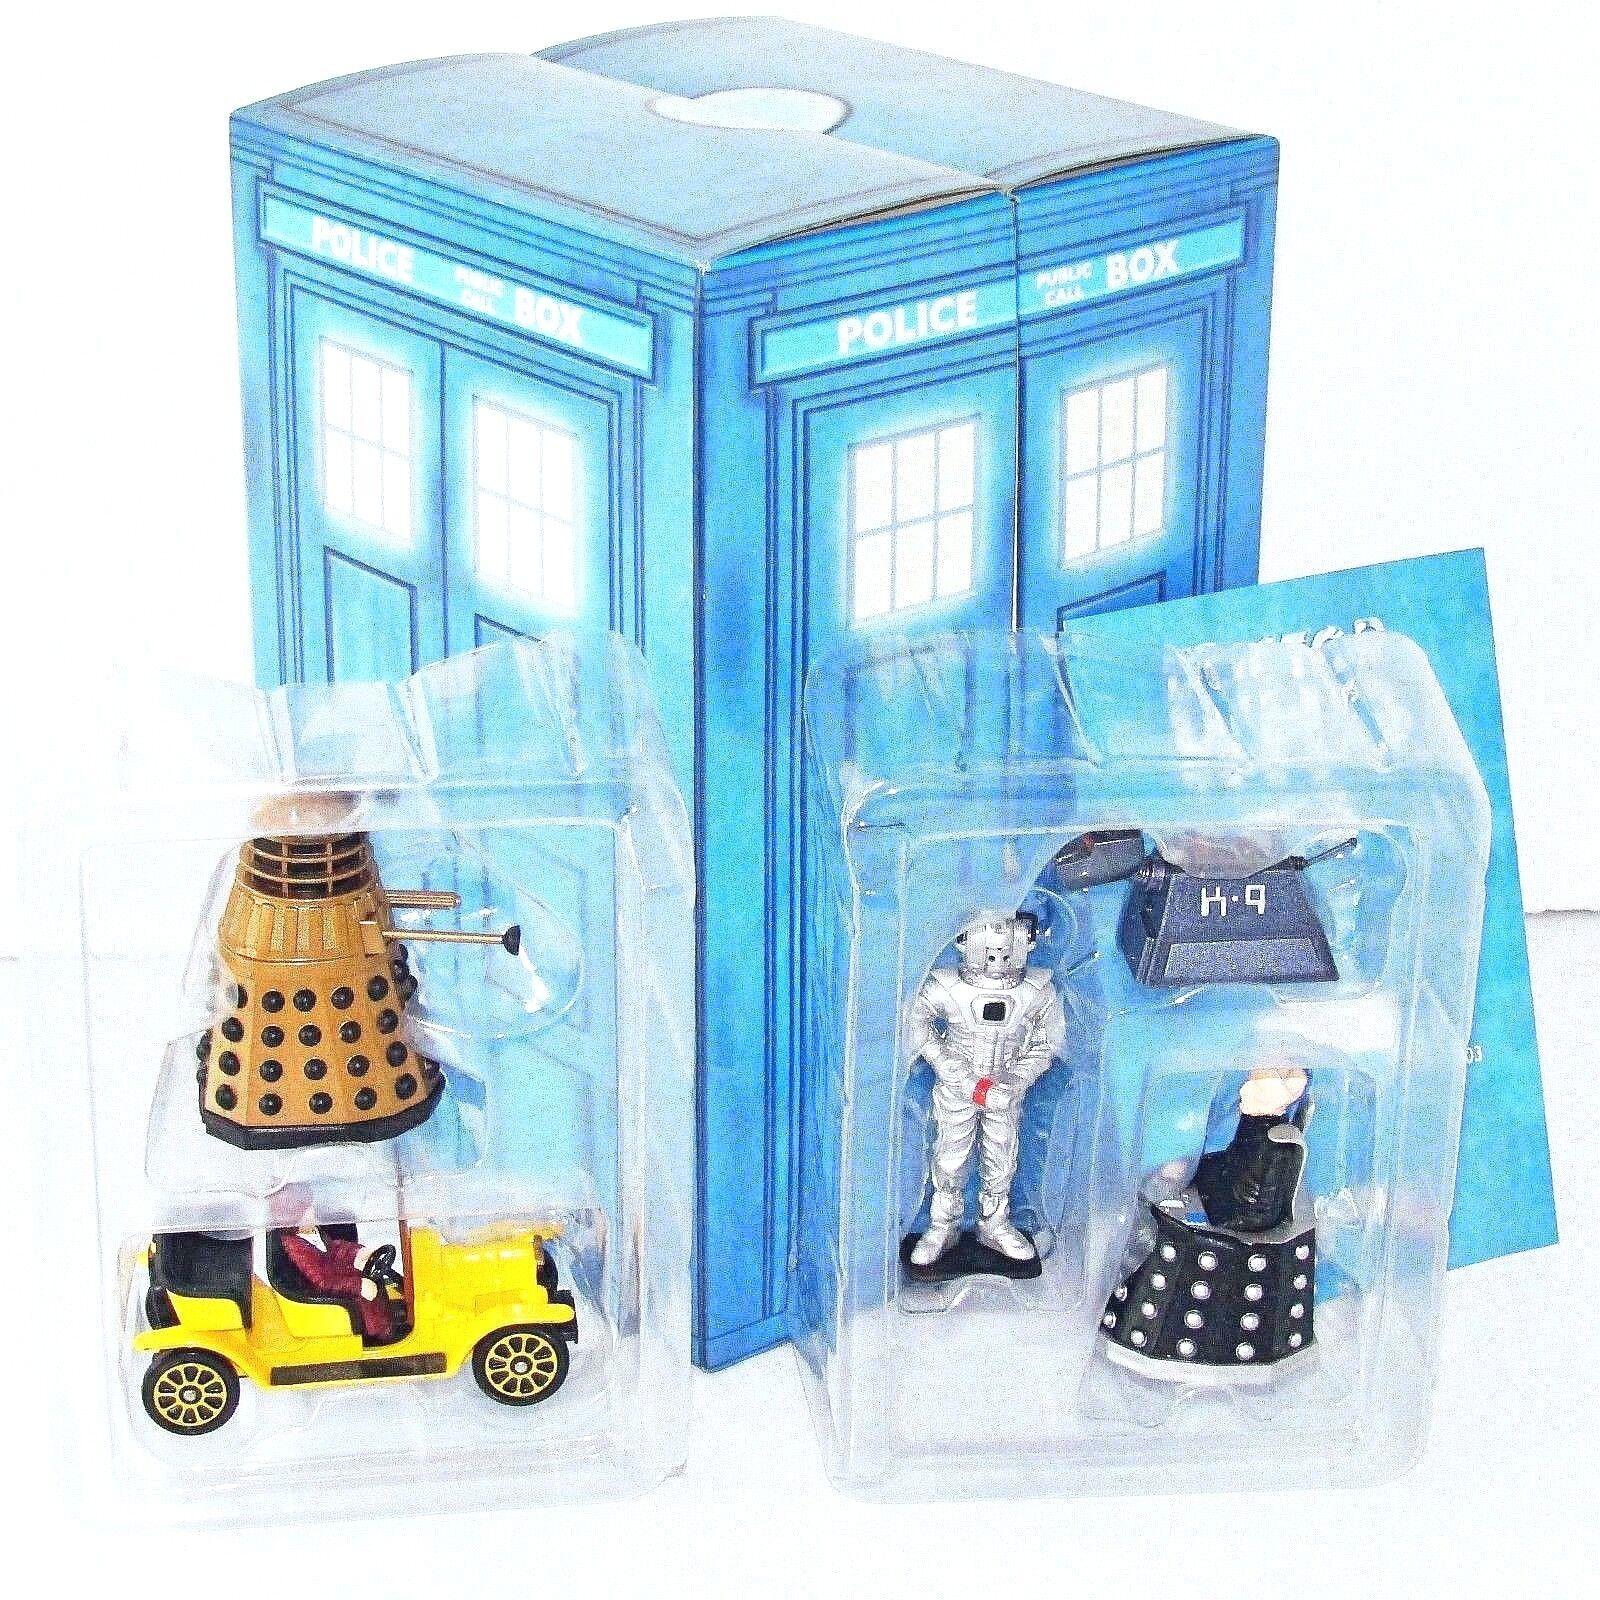 Corgi Toys 1 43 DR. WHO POLICE TELEPHONE StiefelH TV Movie Model Car + Figures MIB